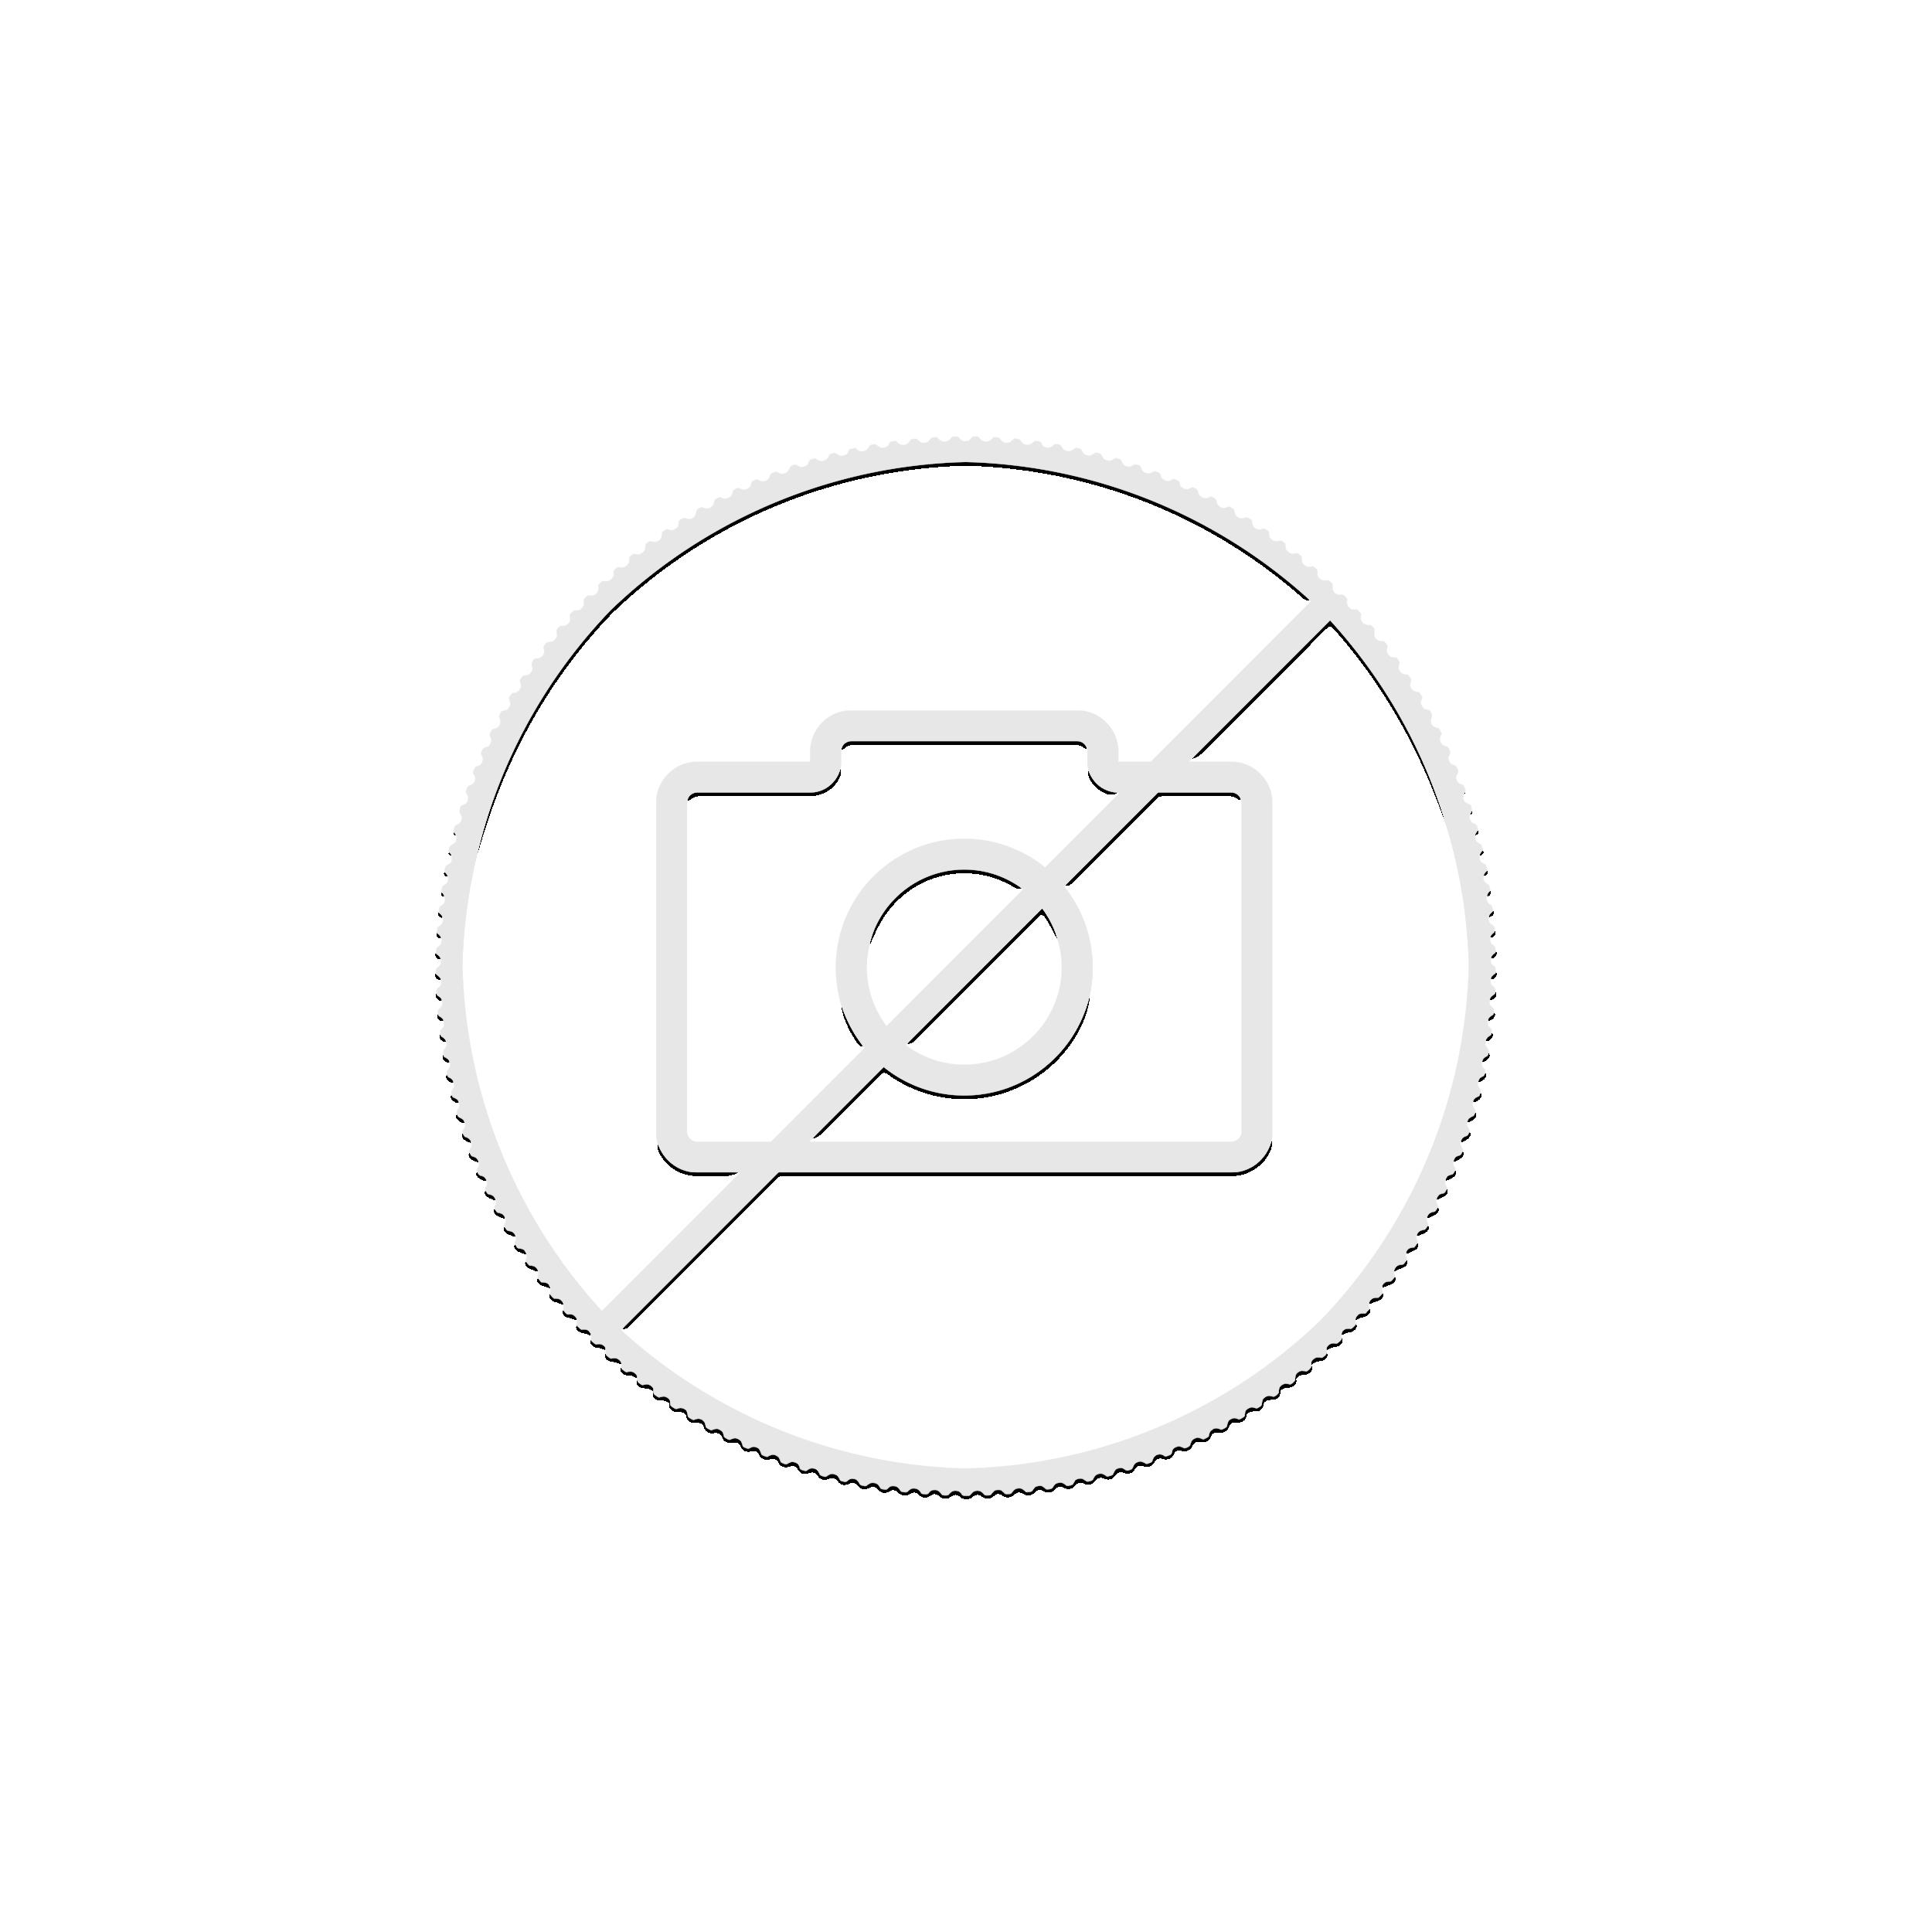 5-Delige set gouden munten Panda 201